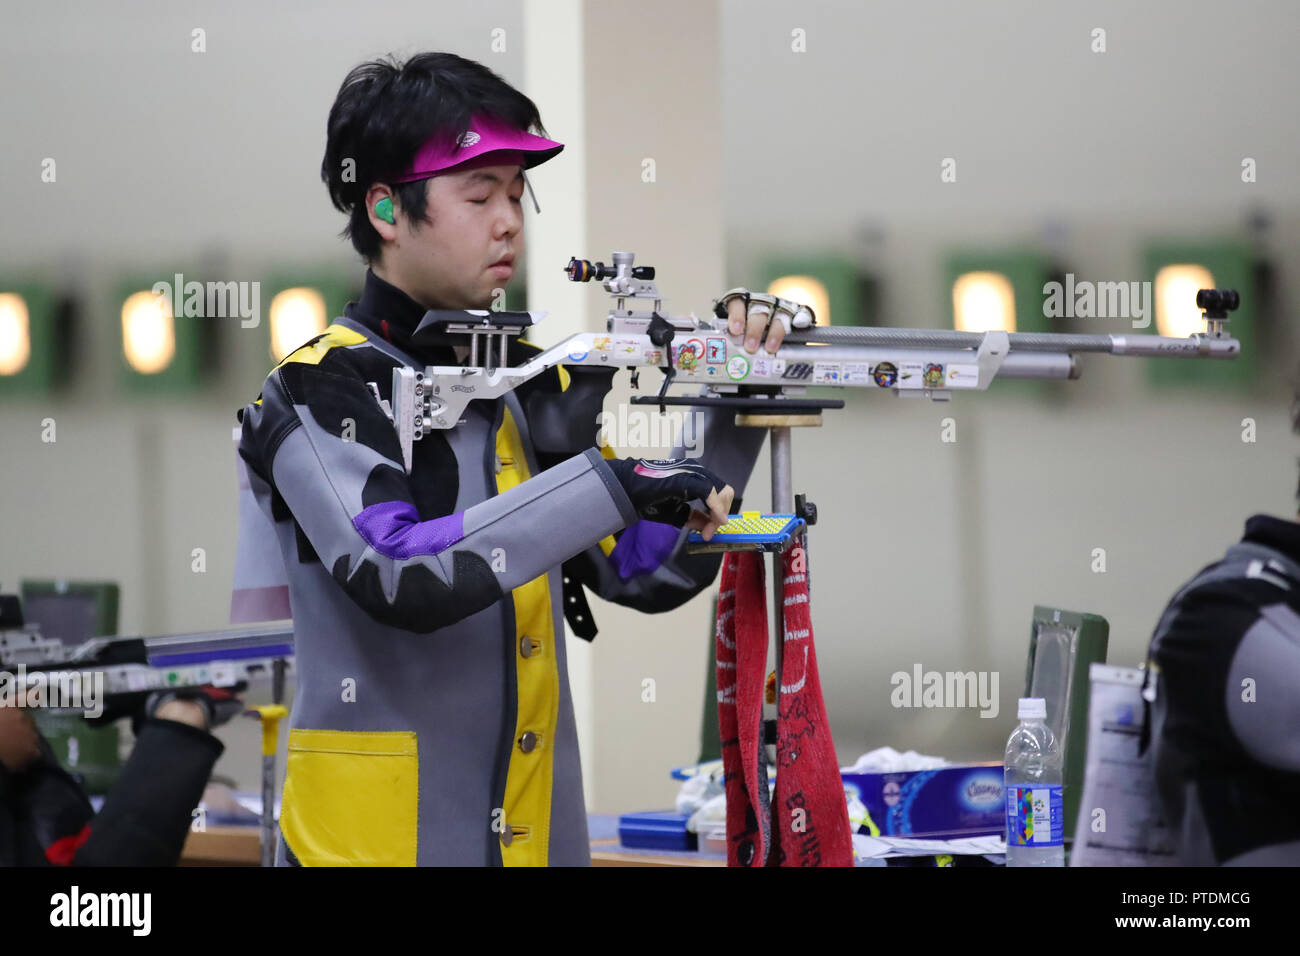 Jakarta, Indonesia. 8th Oct, 2018. Takahiro Mochizuki (JPN) Shooting : Men's 10m Air Rifle Standing - SH1 Qualification Round at GBK Shooting during the 3rd Asian Para Games in Jakarta, Indonesia . Credit: YUTAKA/AFLO SPORT/Alamy Live News - Stock Image